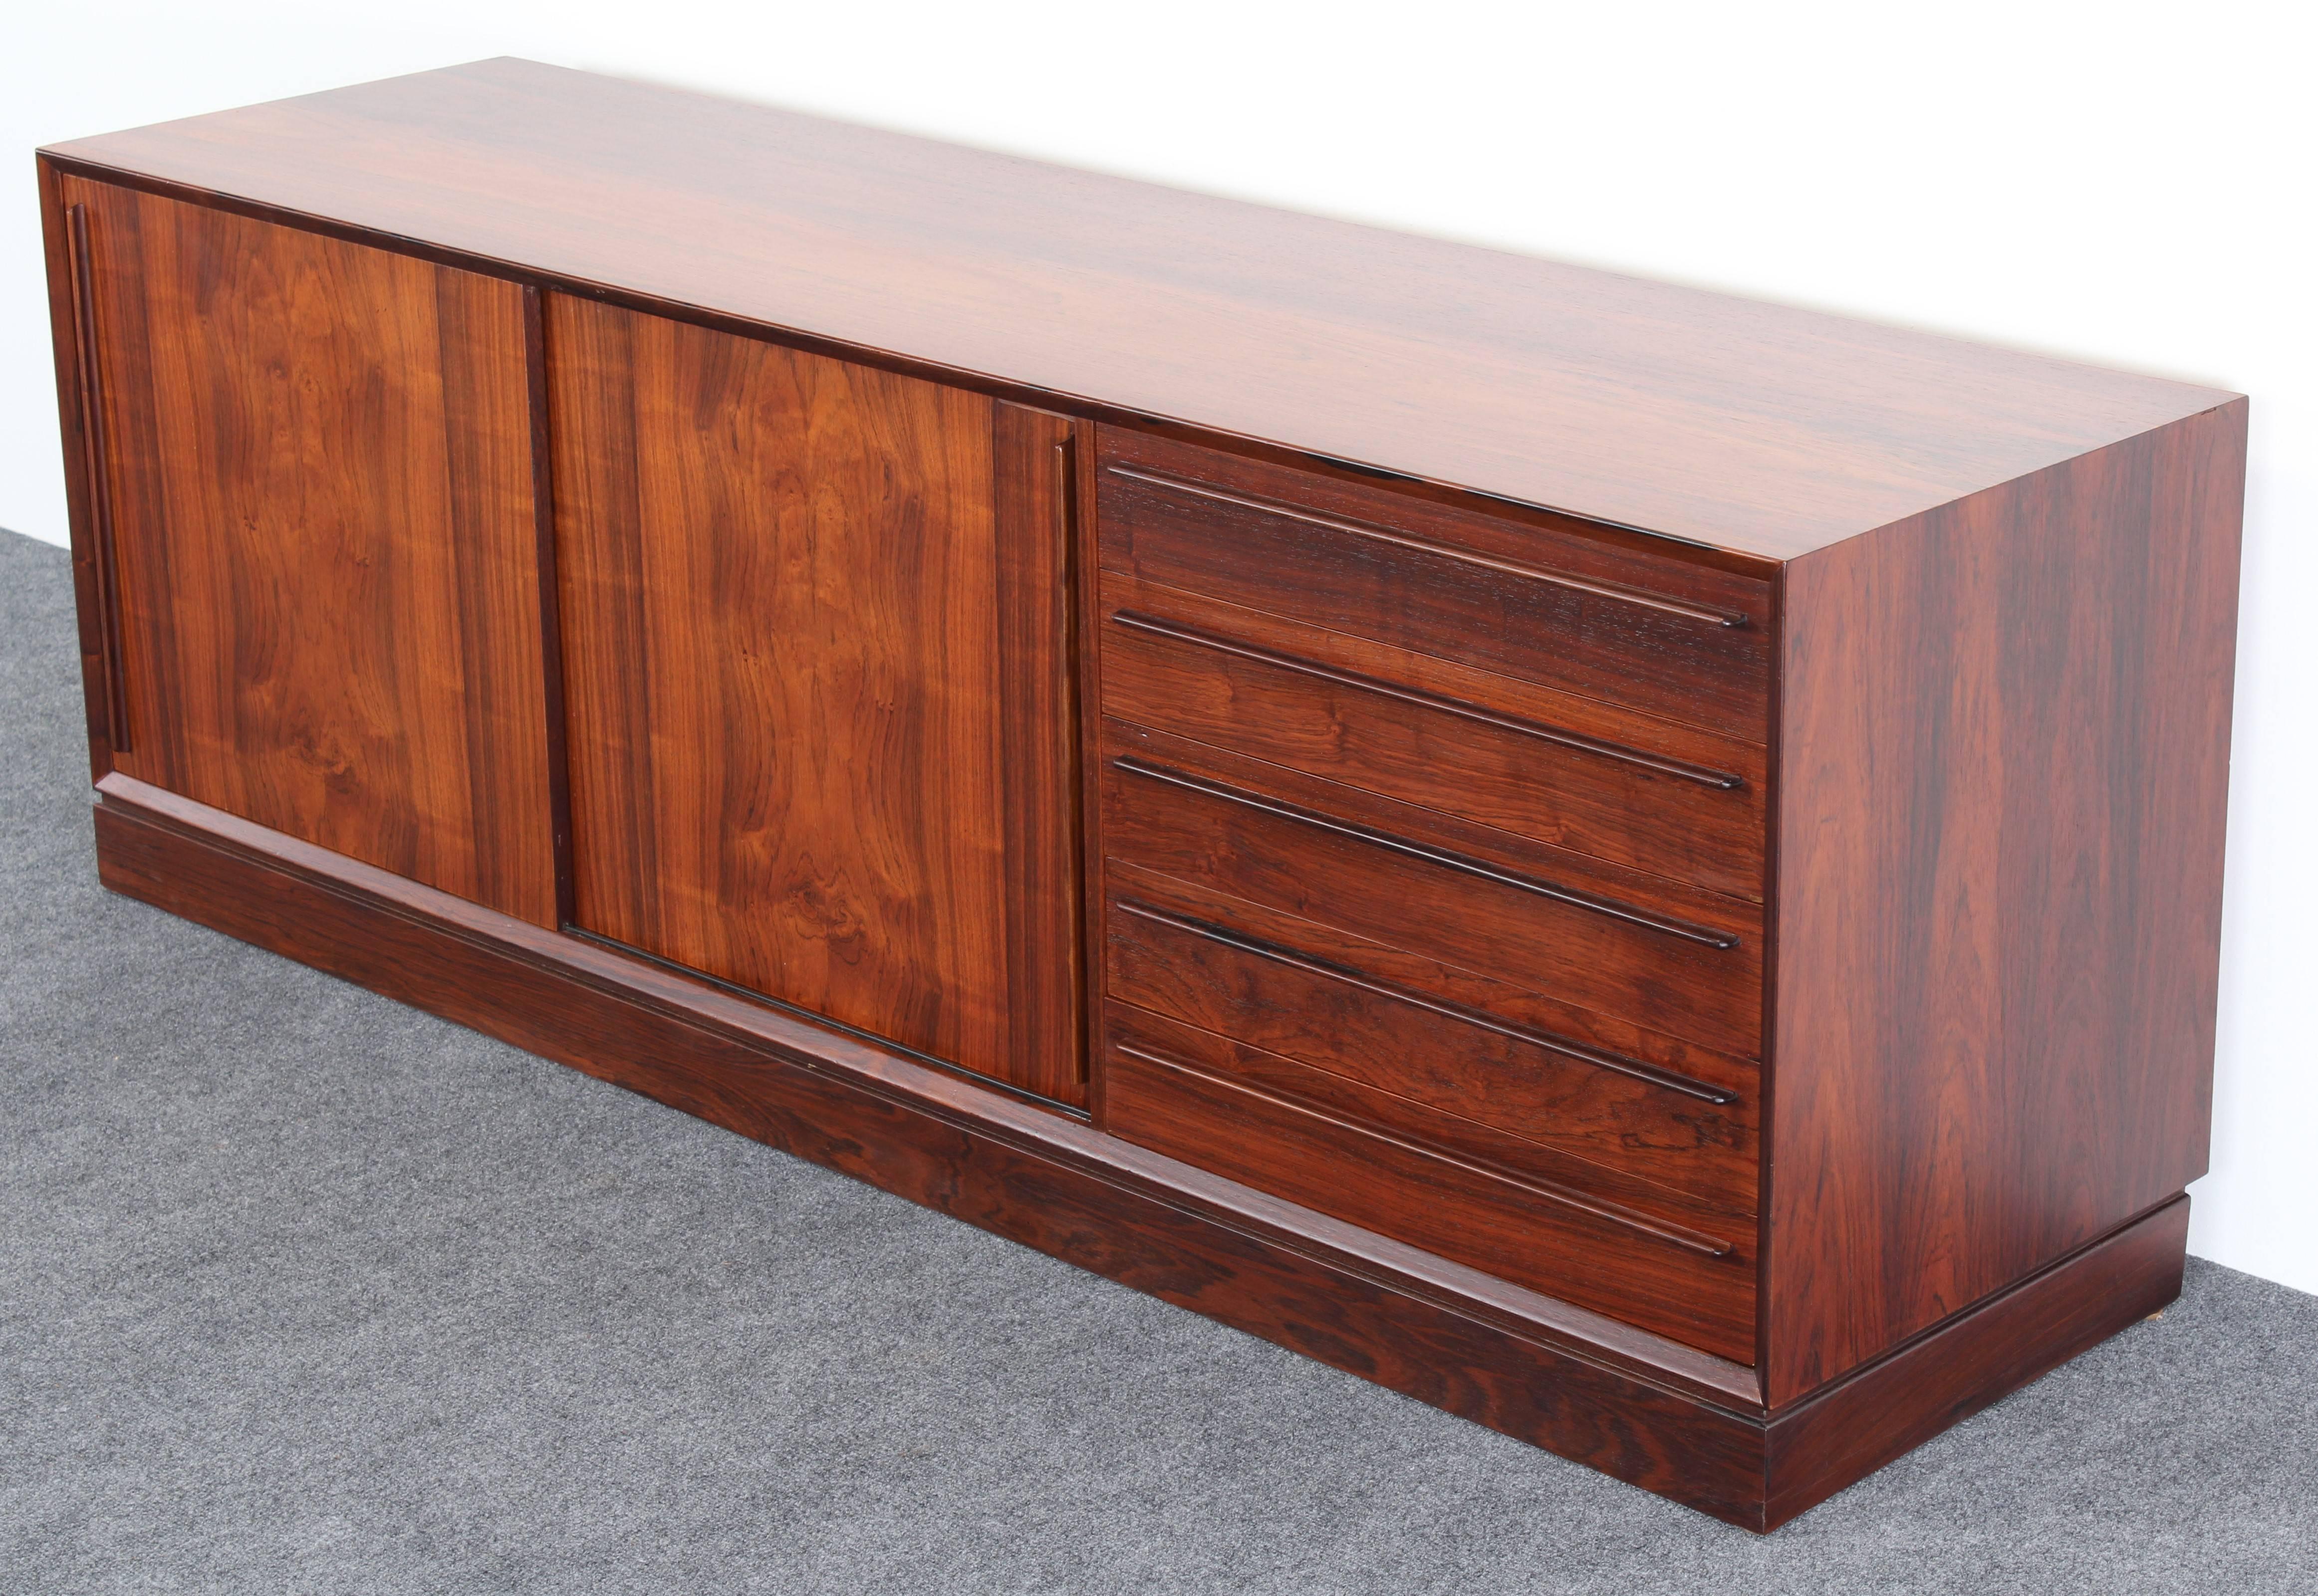 Danish Rosewood Credenza : H p hansen danish rosewood credenza s for sale at stdibs